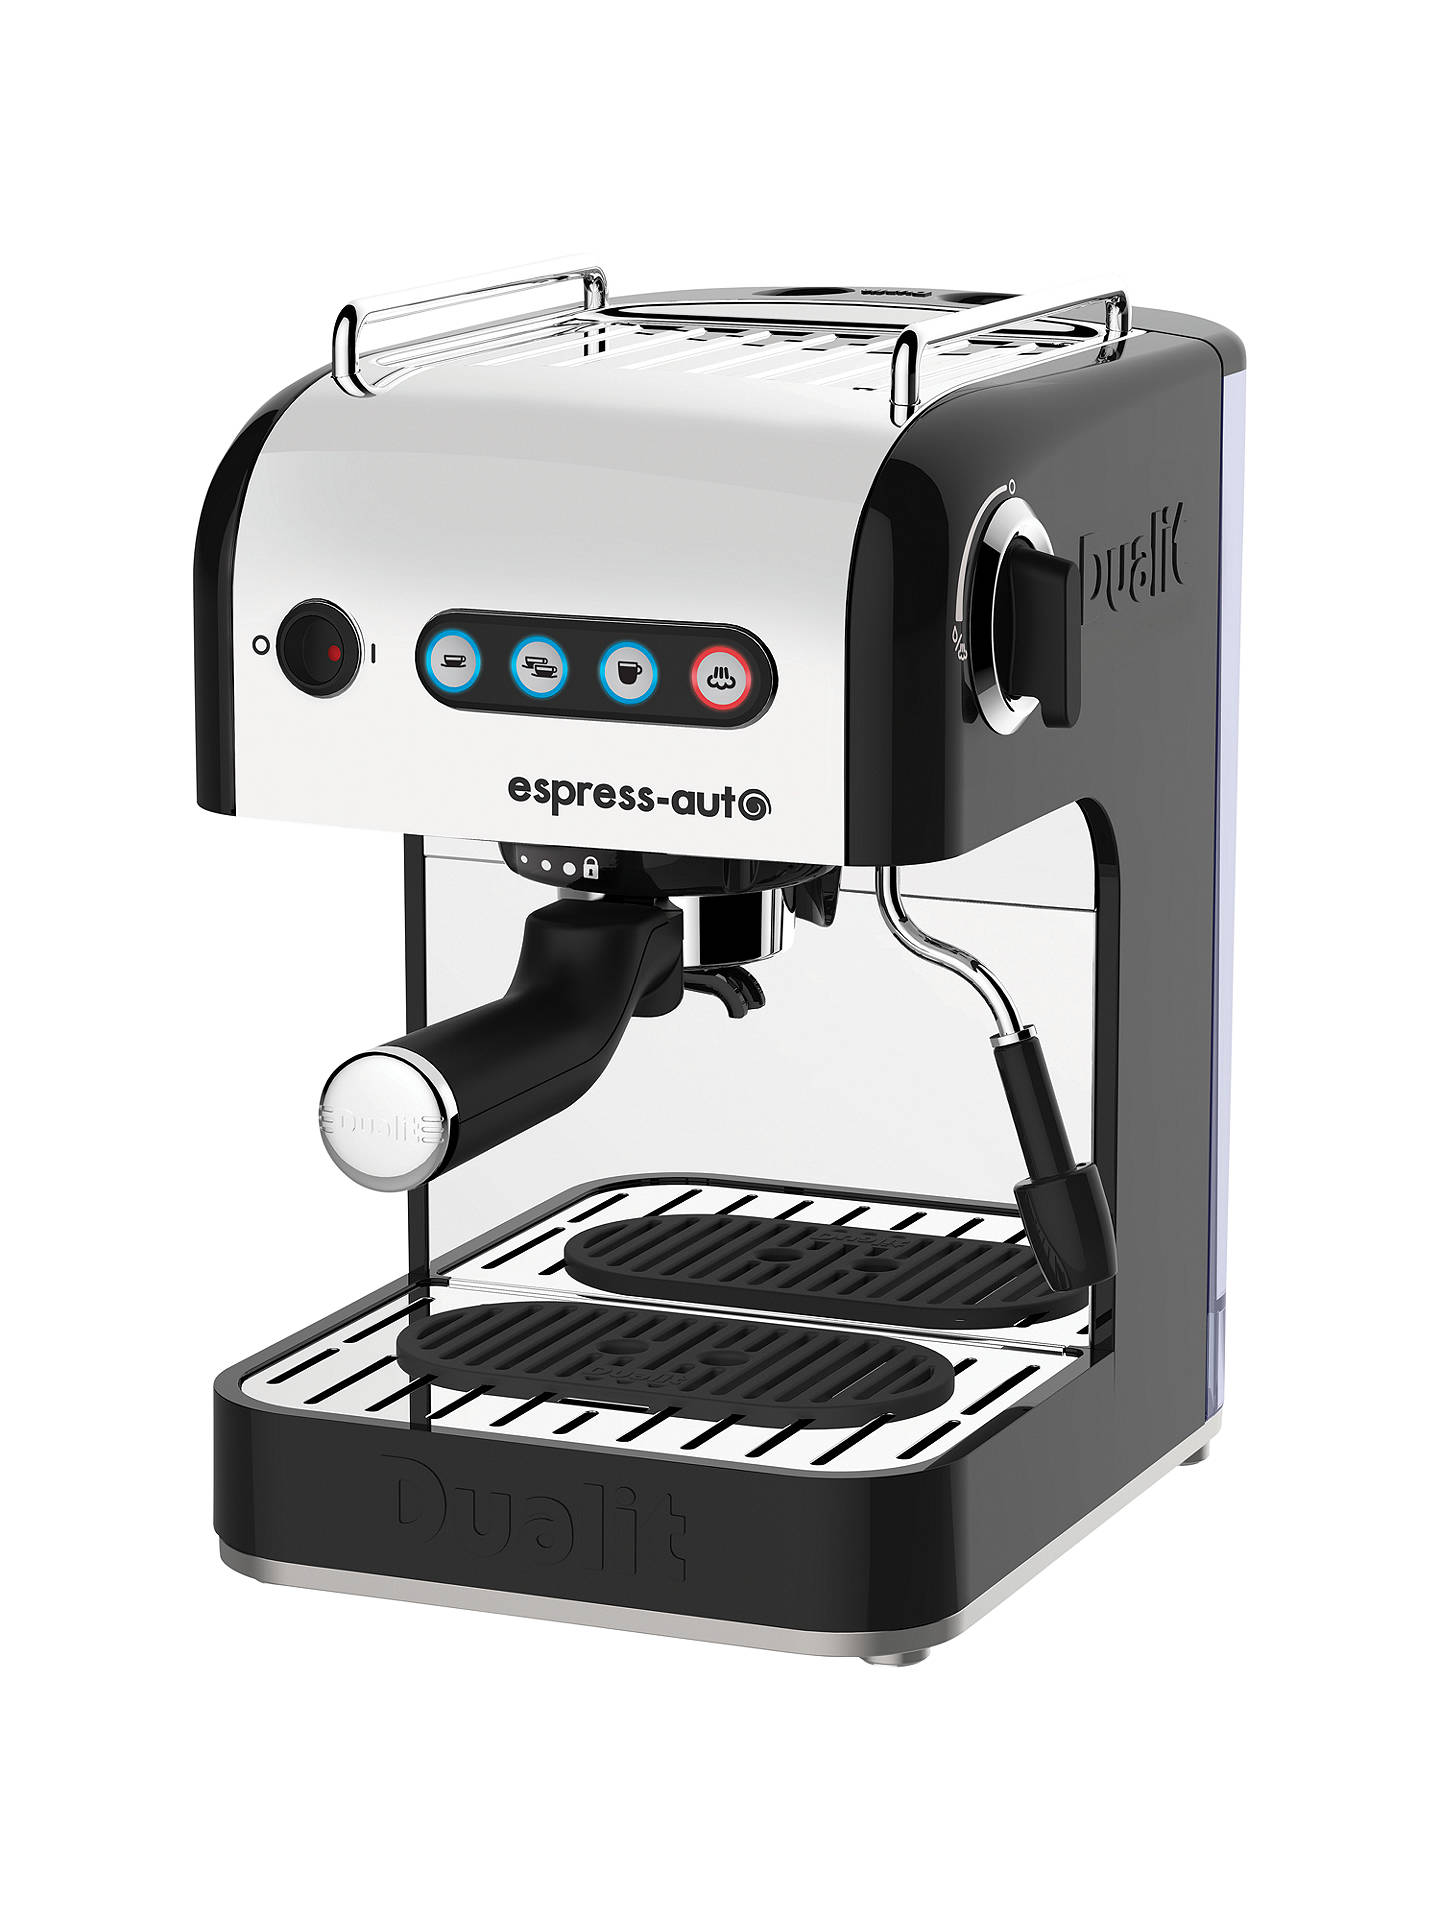 Dualit 84515 Espress Auto 3 In 1 Coffee Machine Black At John Lewis